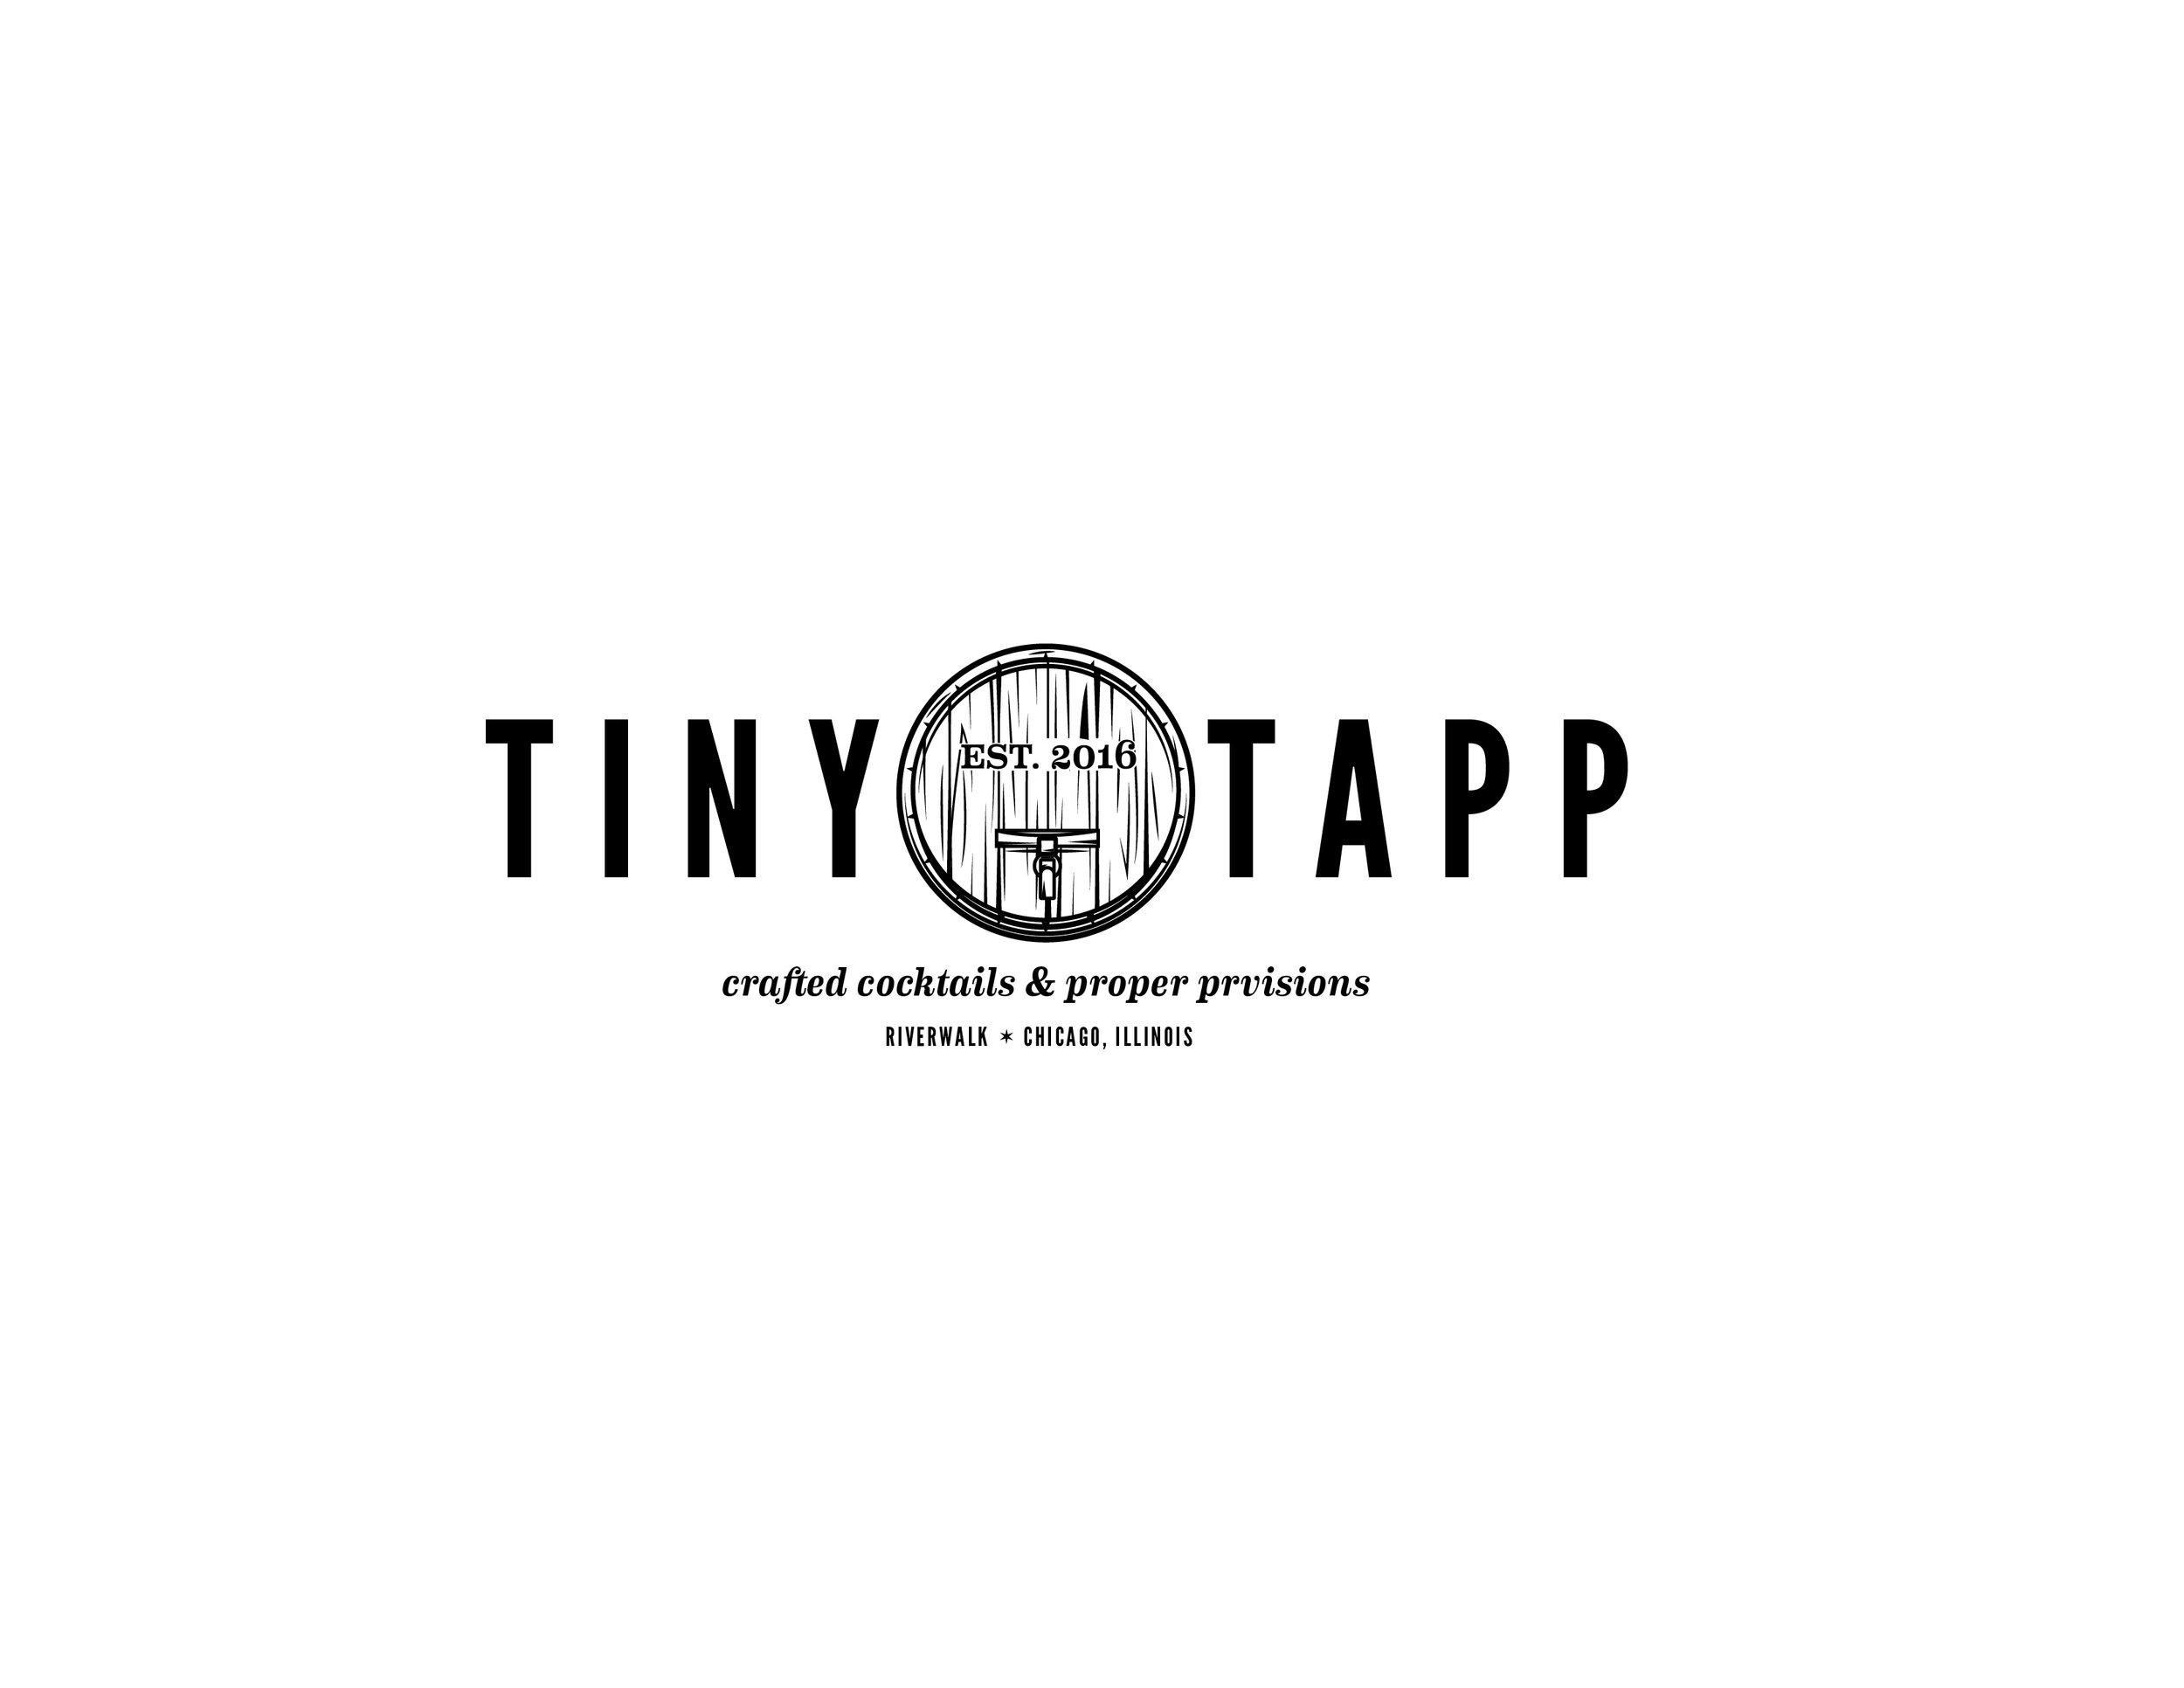 tinytapp_logo_horz_k copy.jpg